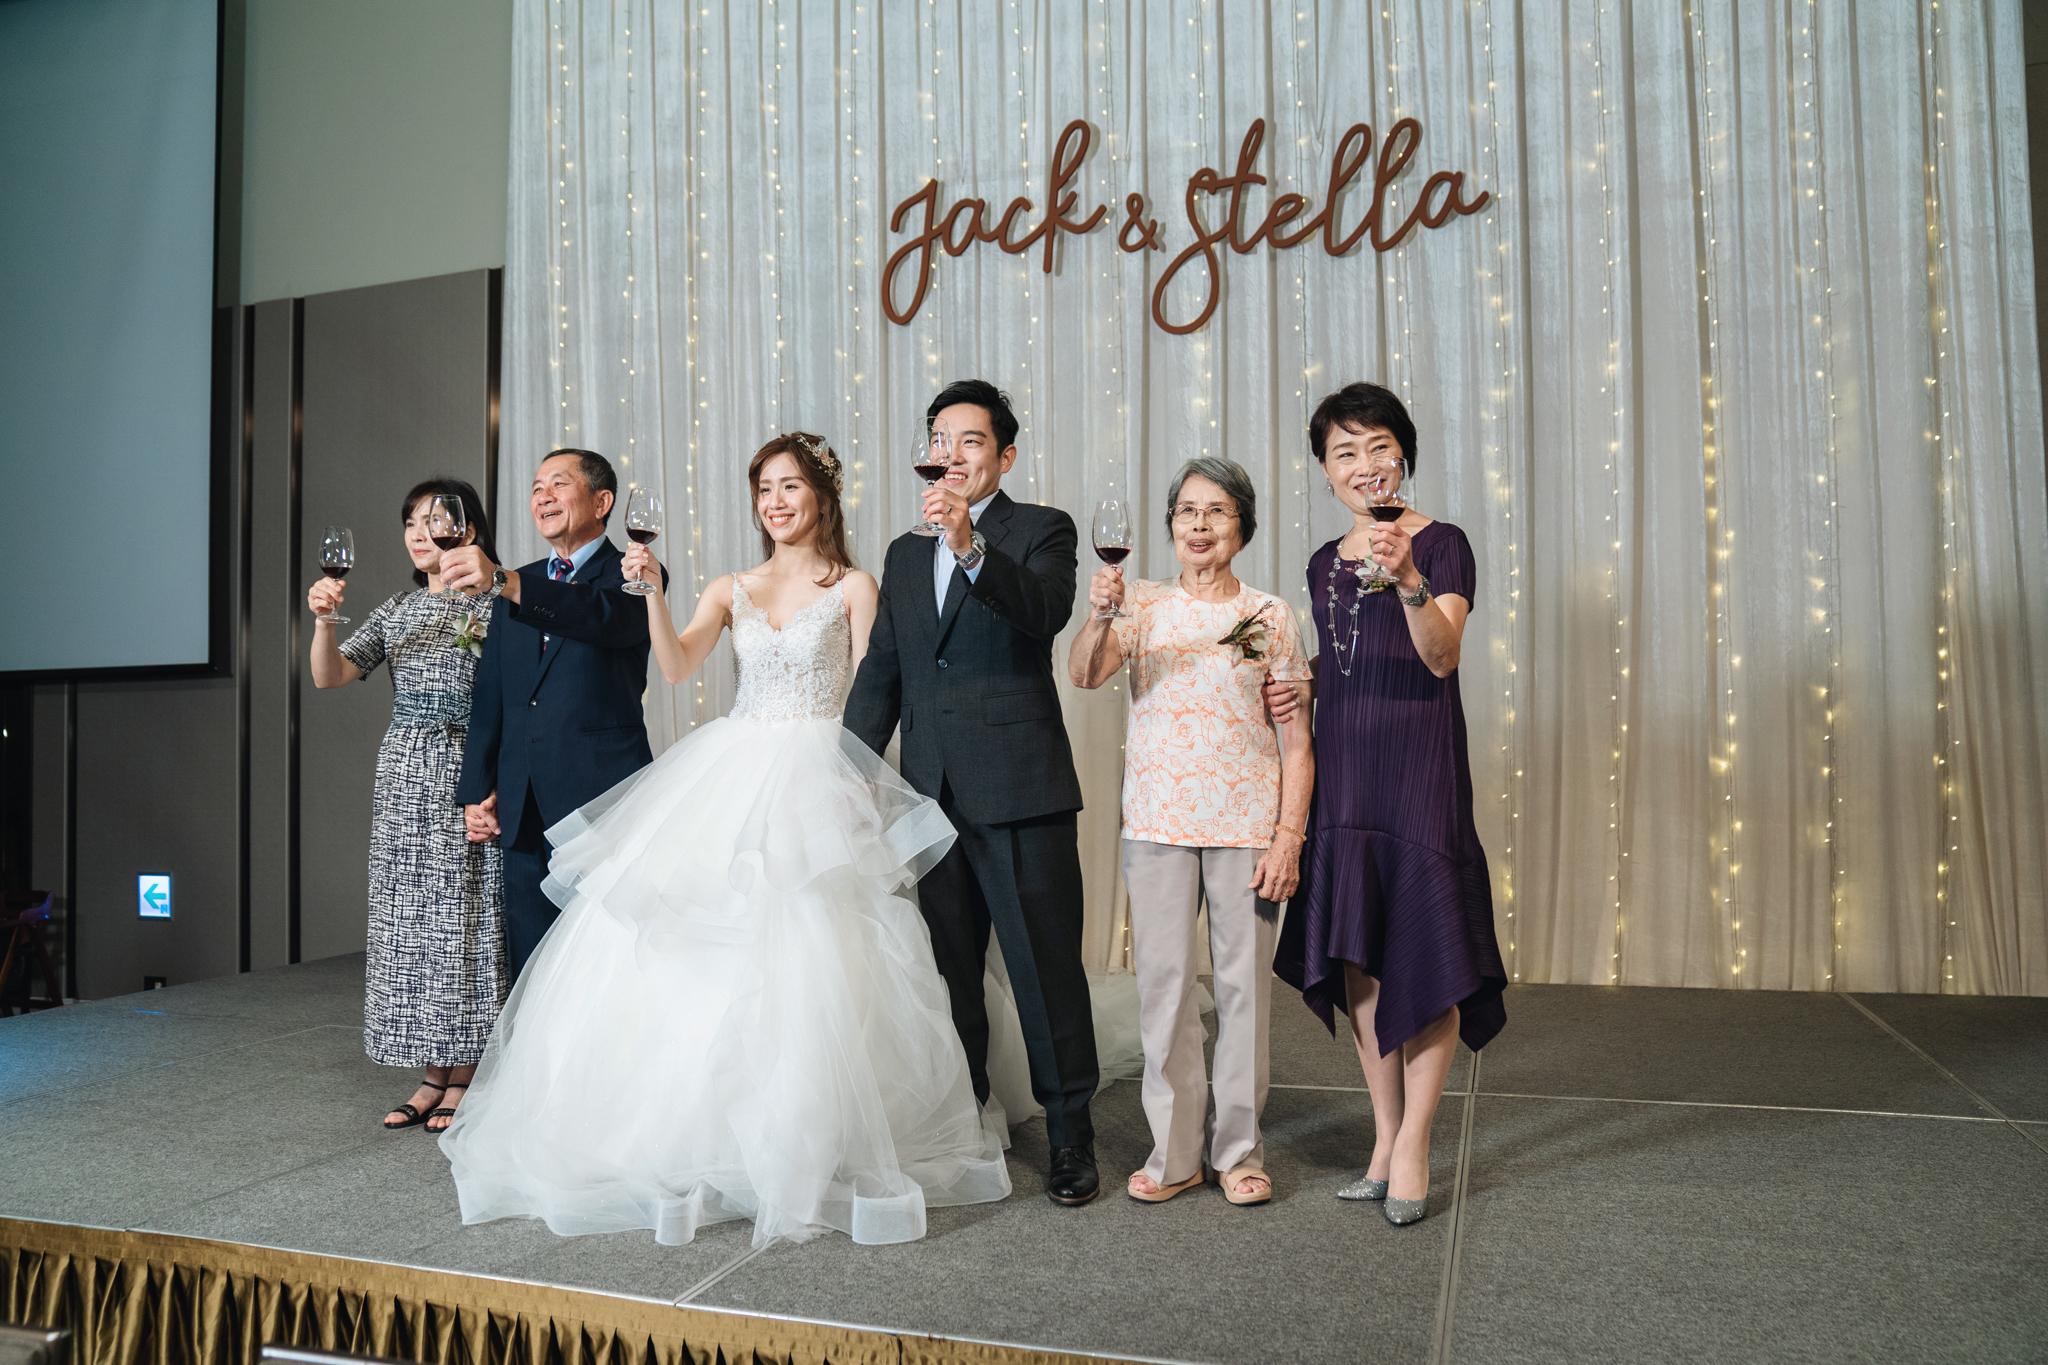 EASTERN WEDDING, Donfer, 婚禮紀錄, 東法, 萬豪酒店